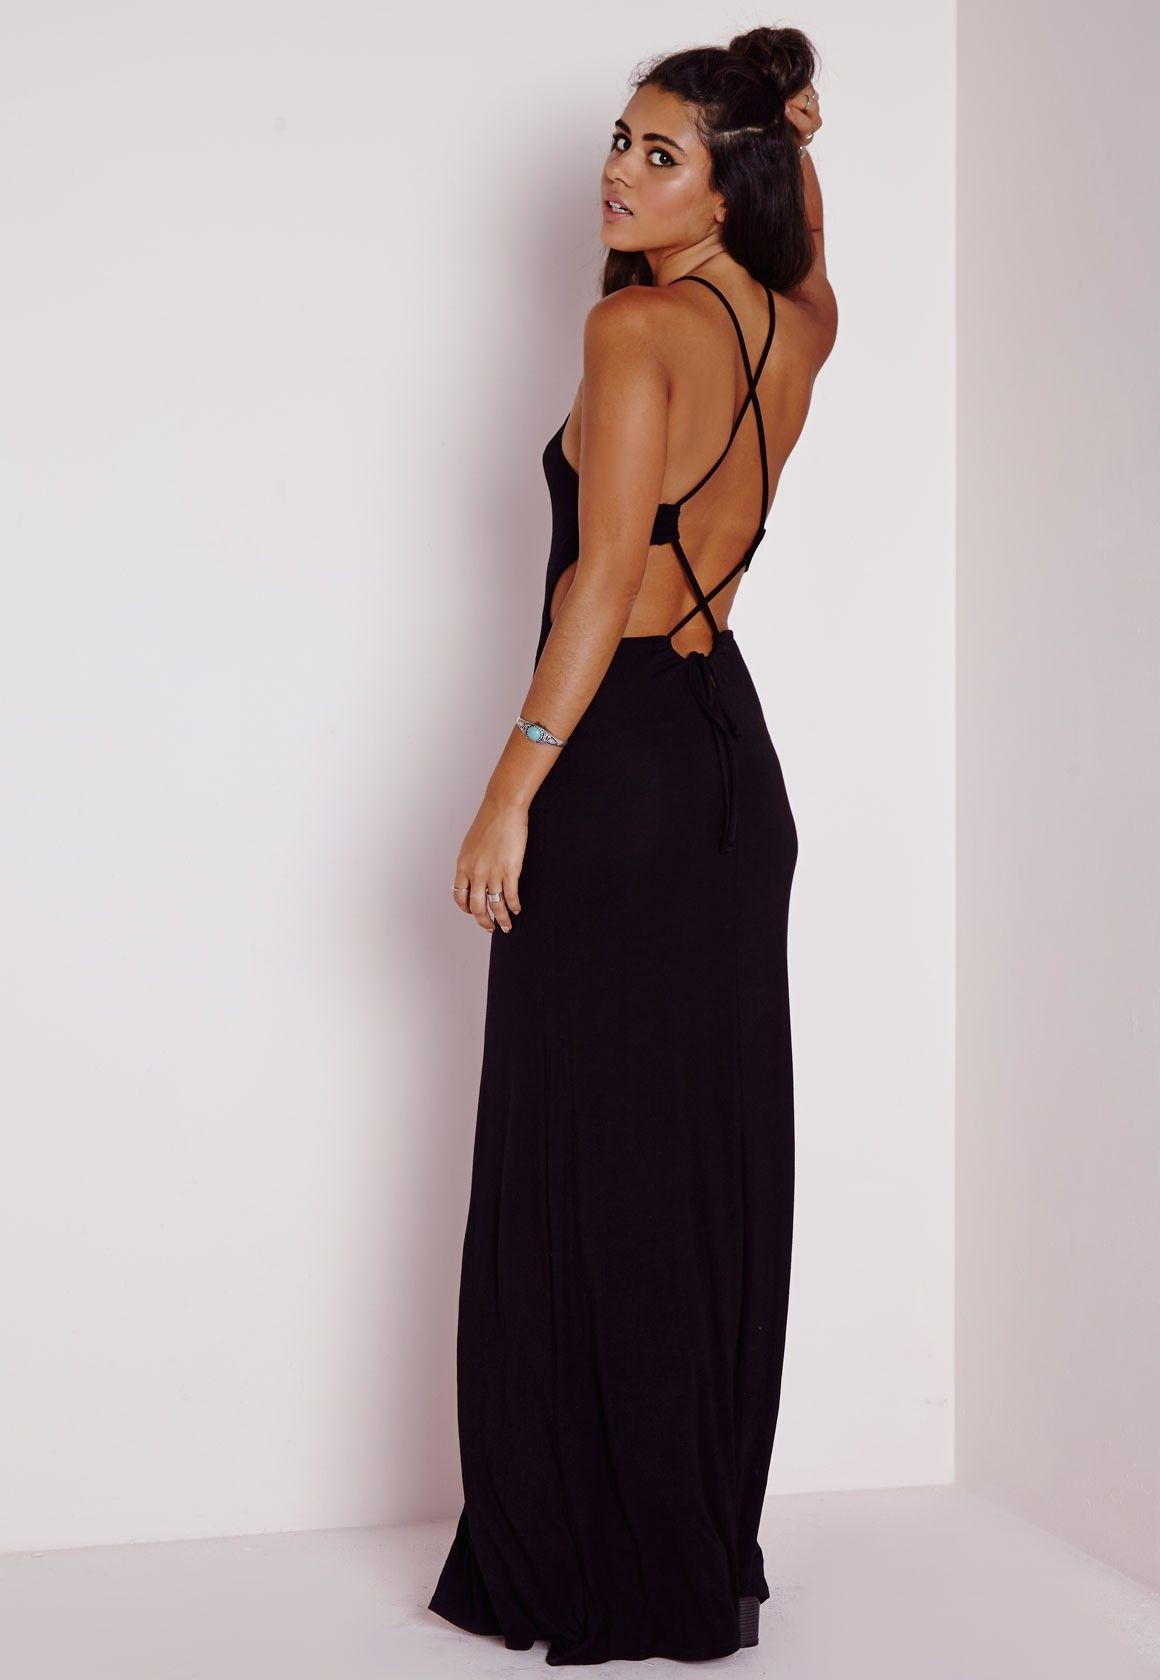 Back Strap Detail Maxi Dress Black - Dresses - Maxi Dresses ...